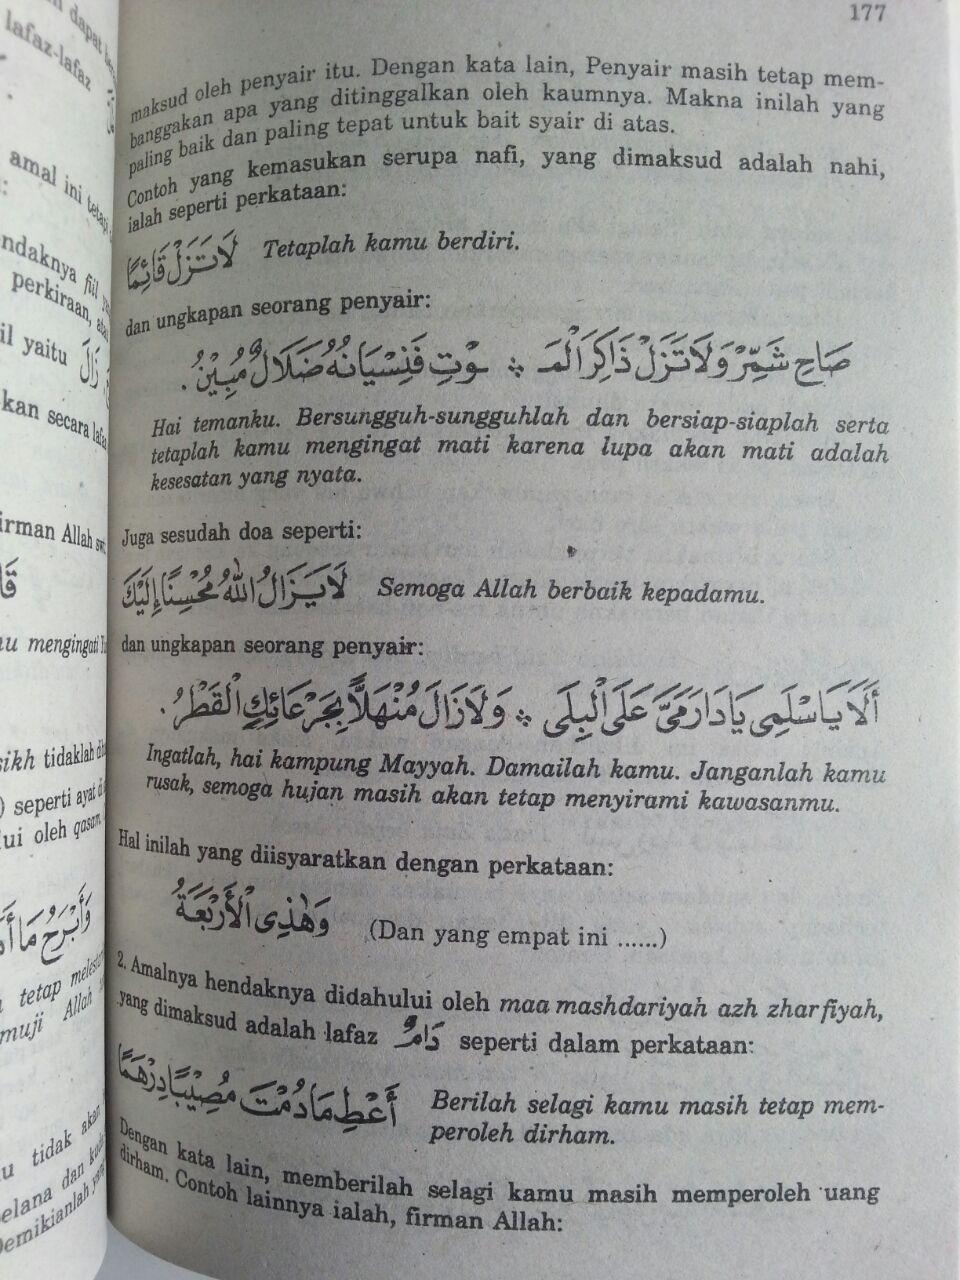 Buku Terjemahan Alfiyyah Syarah Ibnu Aqil Soft Cover Set 2 Jilid isi 4